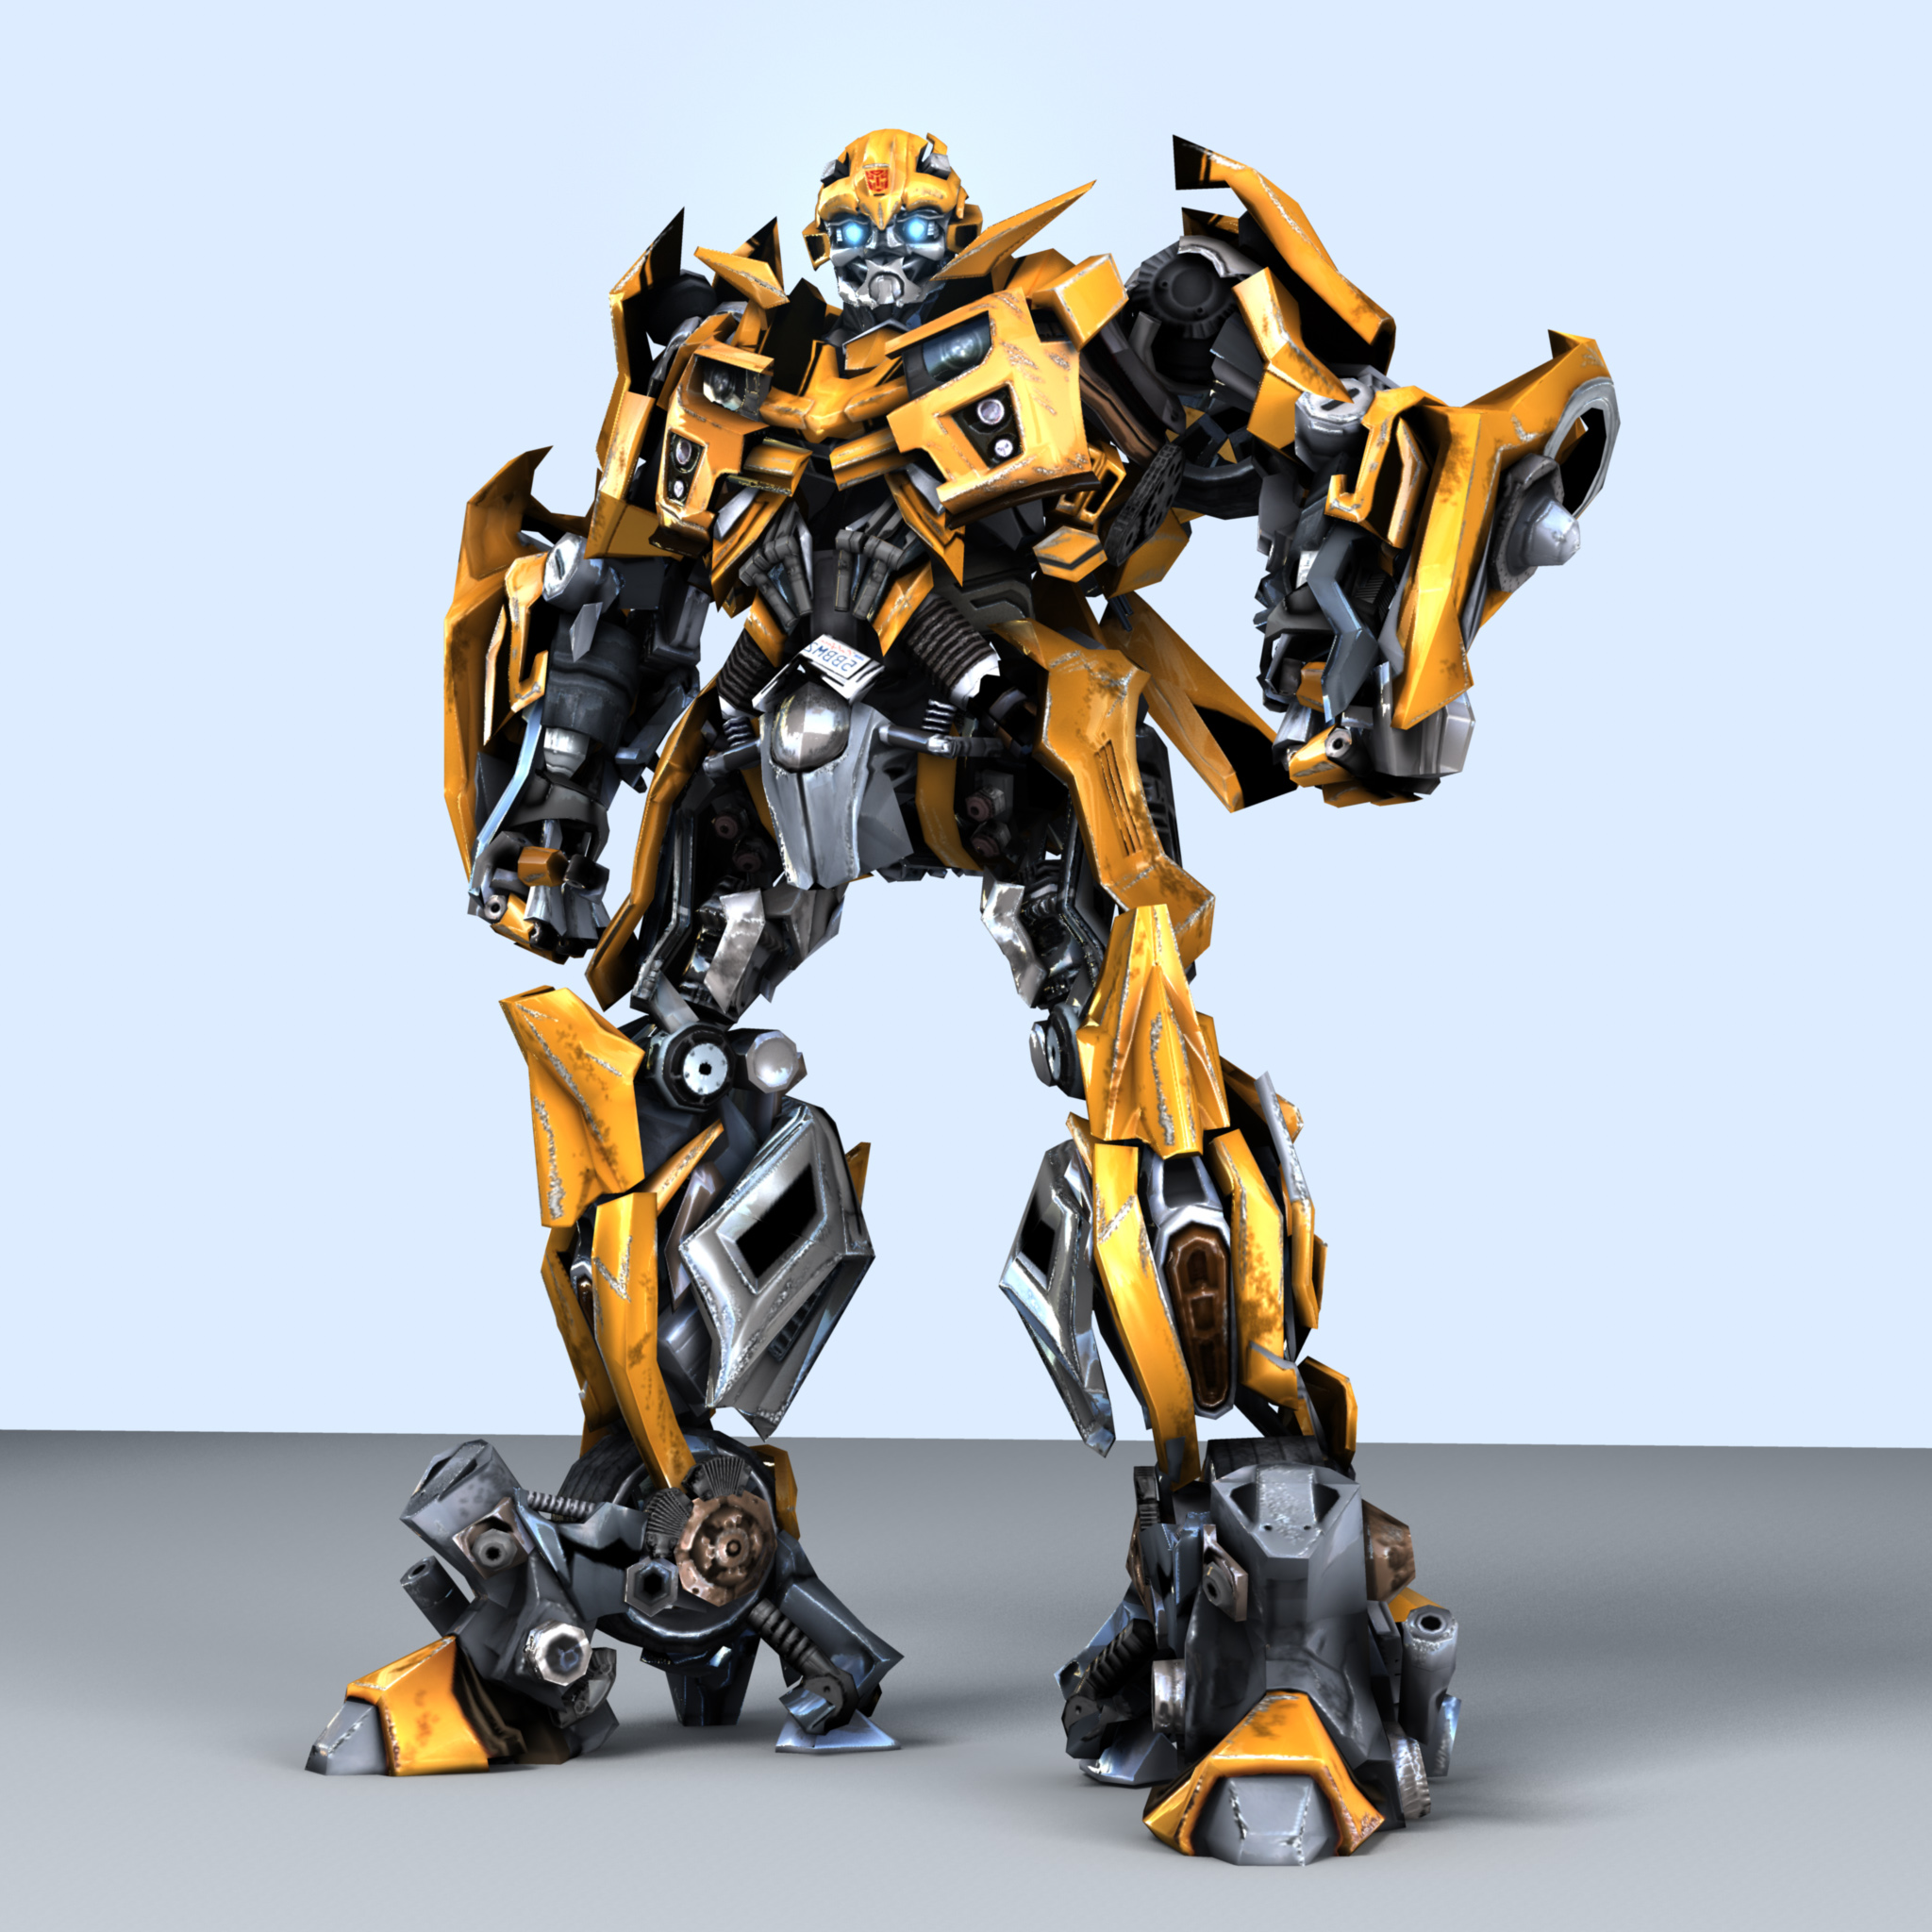 bumblebee transformers. Black Bedroom Furniture Sets. Home Design Ideas